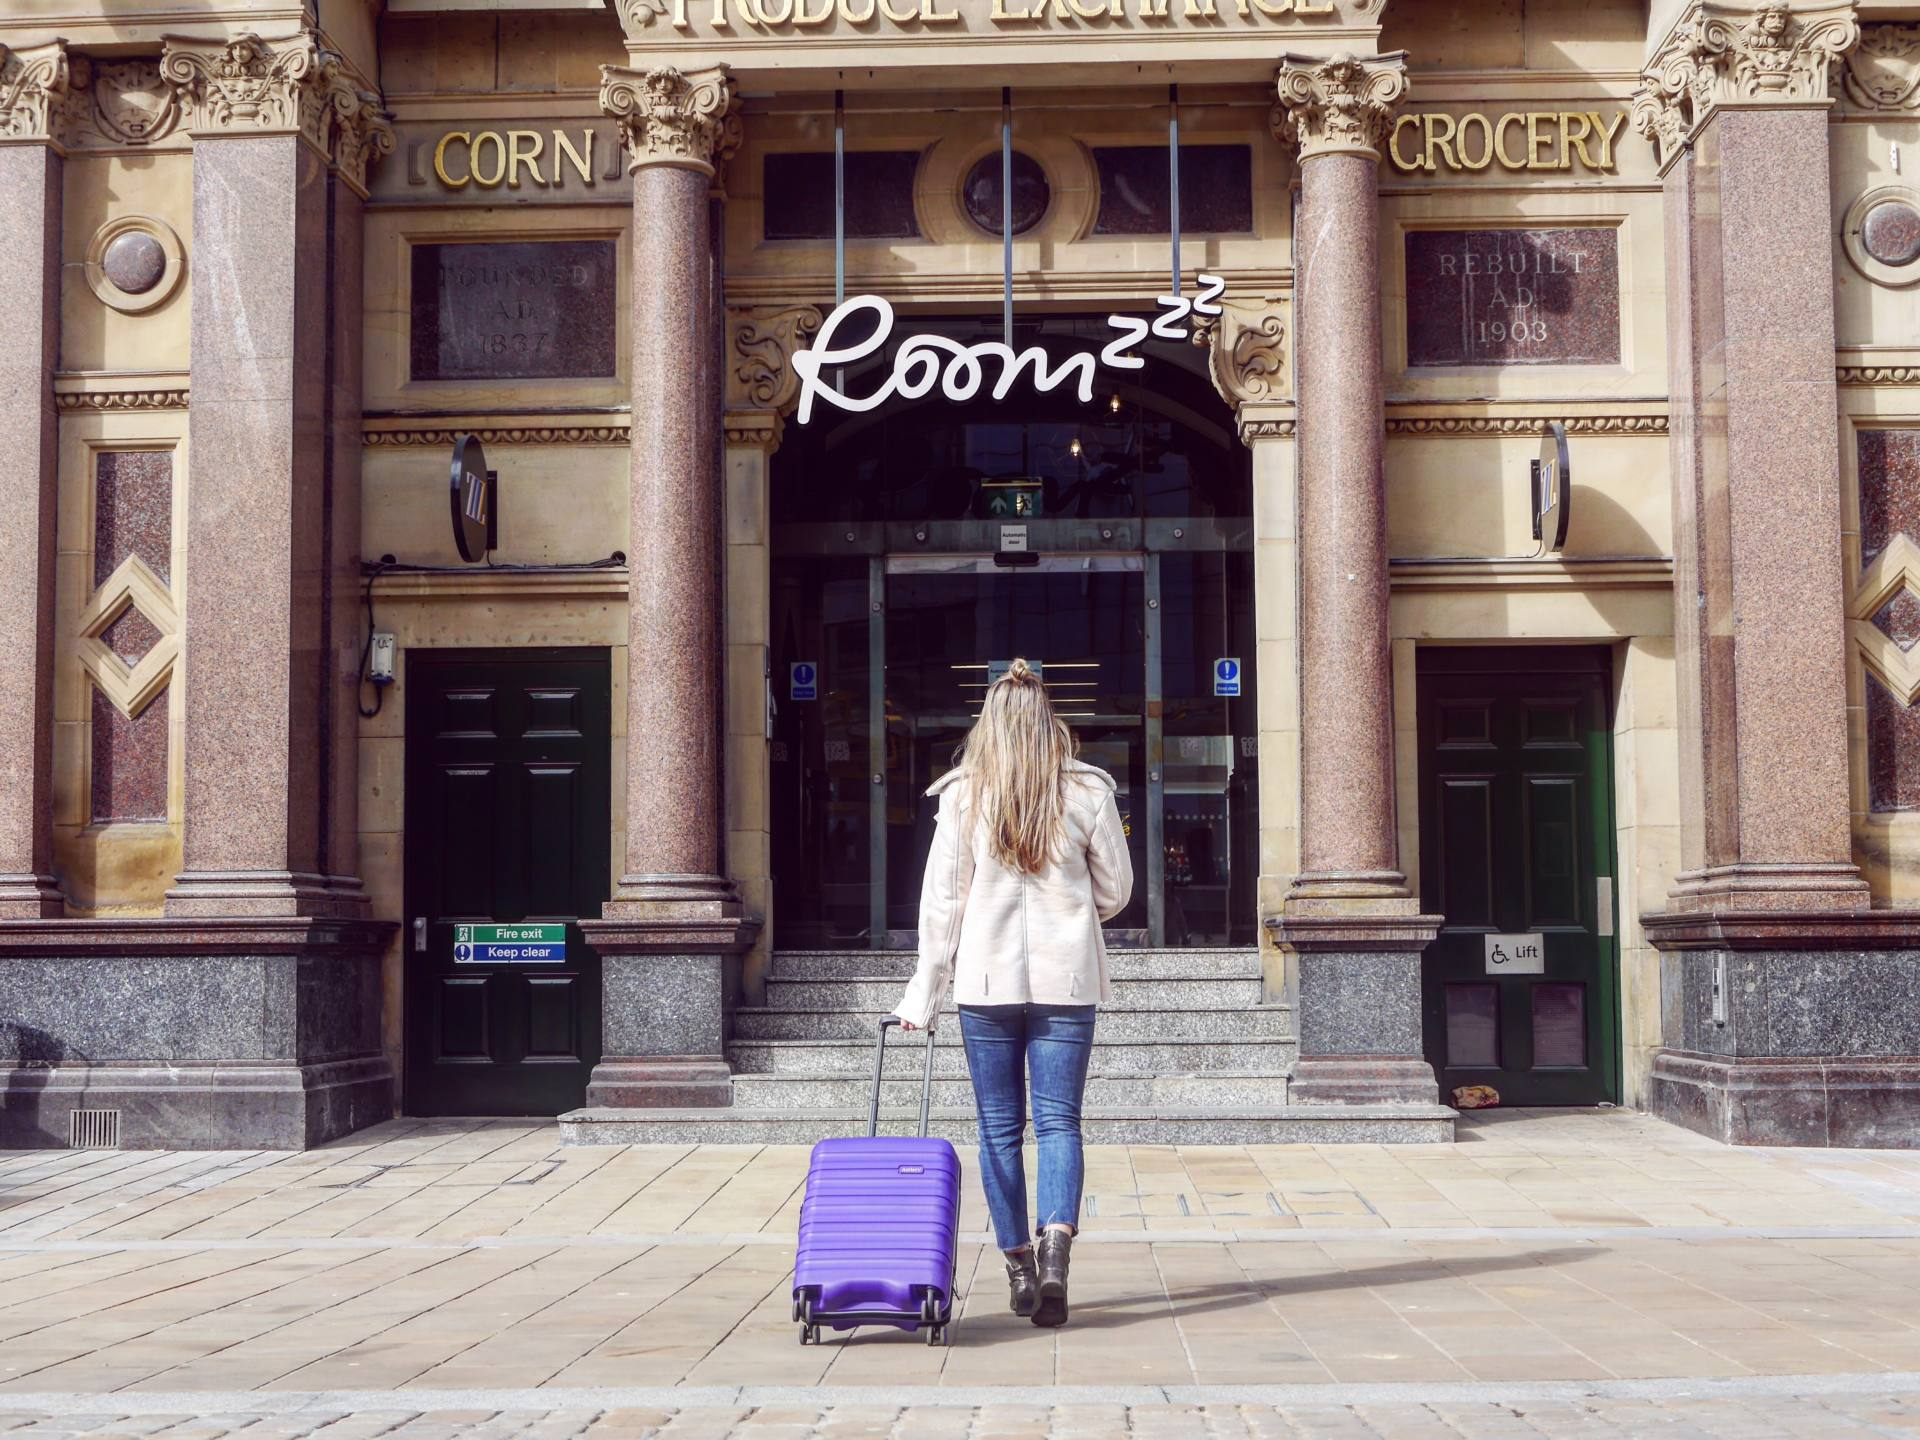 Roomzzz Manchester Corn Exchange Entrance